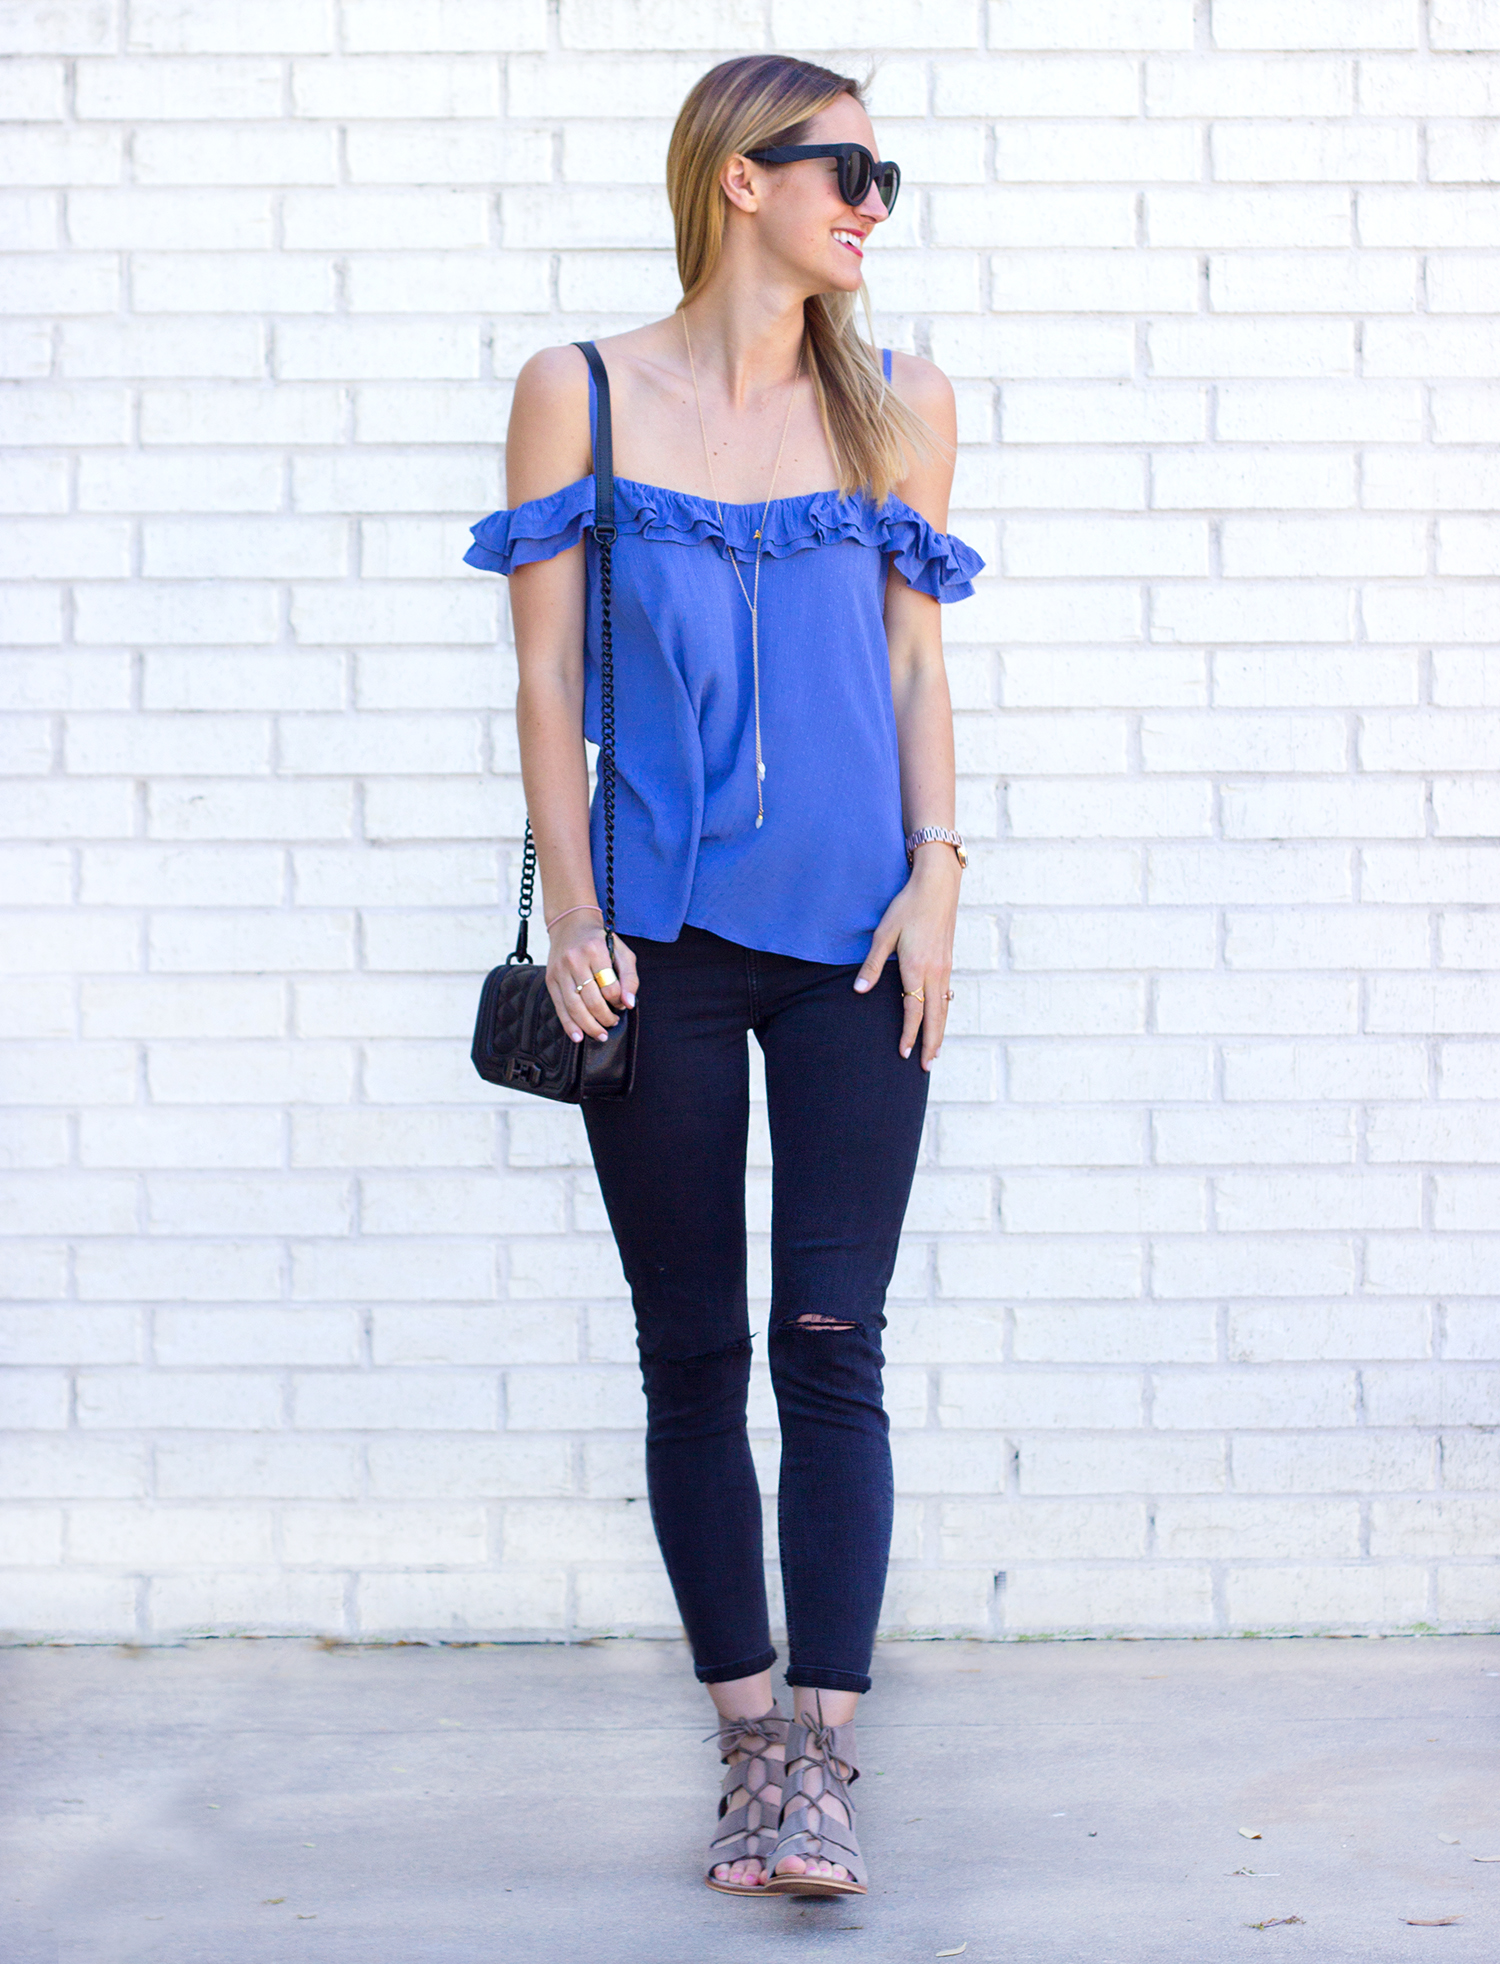 livvyland-blog-olivia-watson-austin-texas-fashion-blogger-topshop-ruffled-off-shoulder-cold-top-black-distressed-skinny-jeans-rebecca-minkoff-mini-love-affair-handbag-4